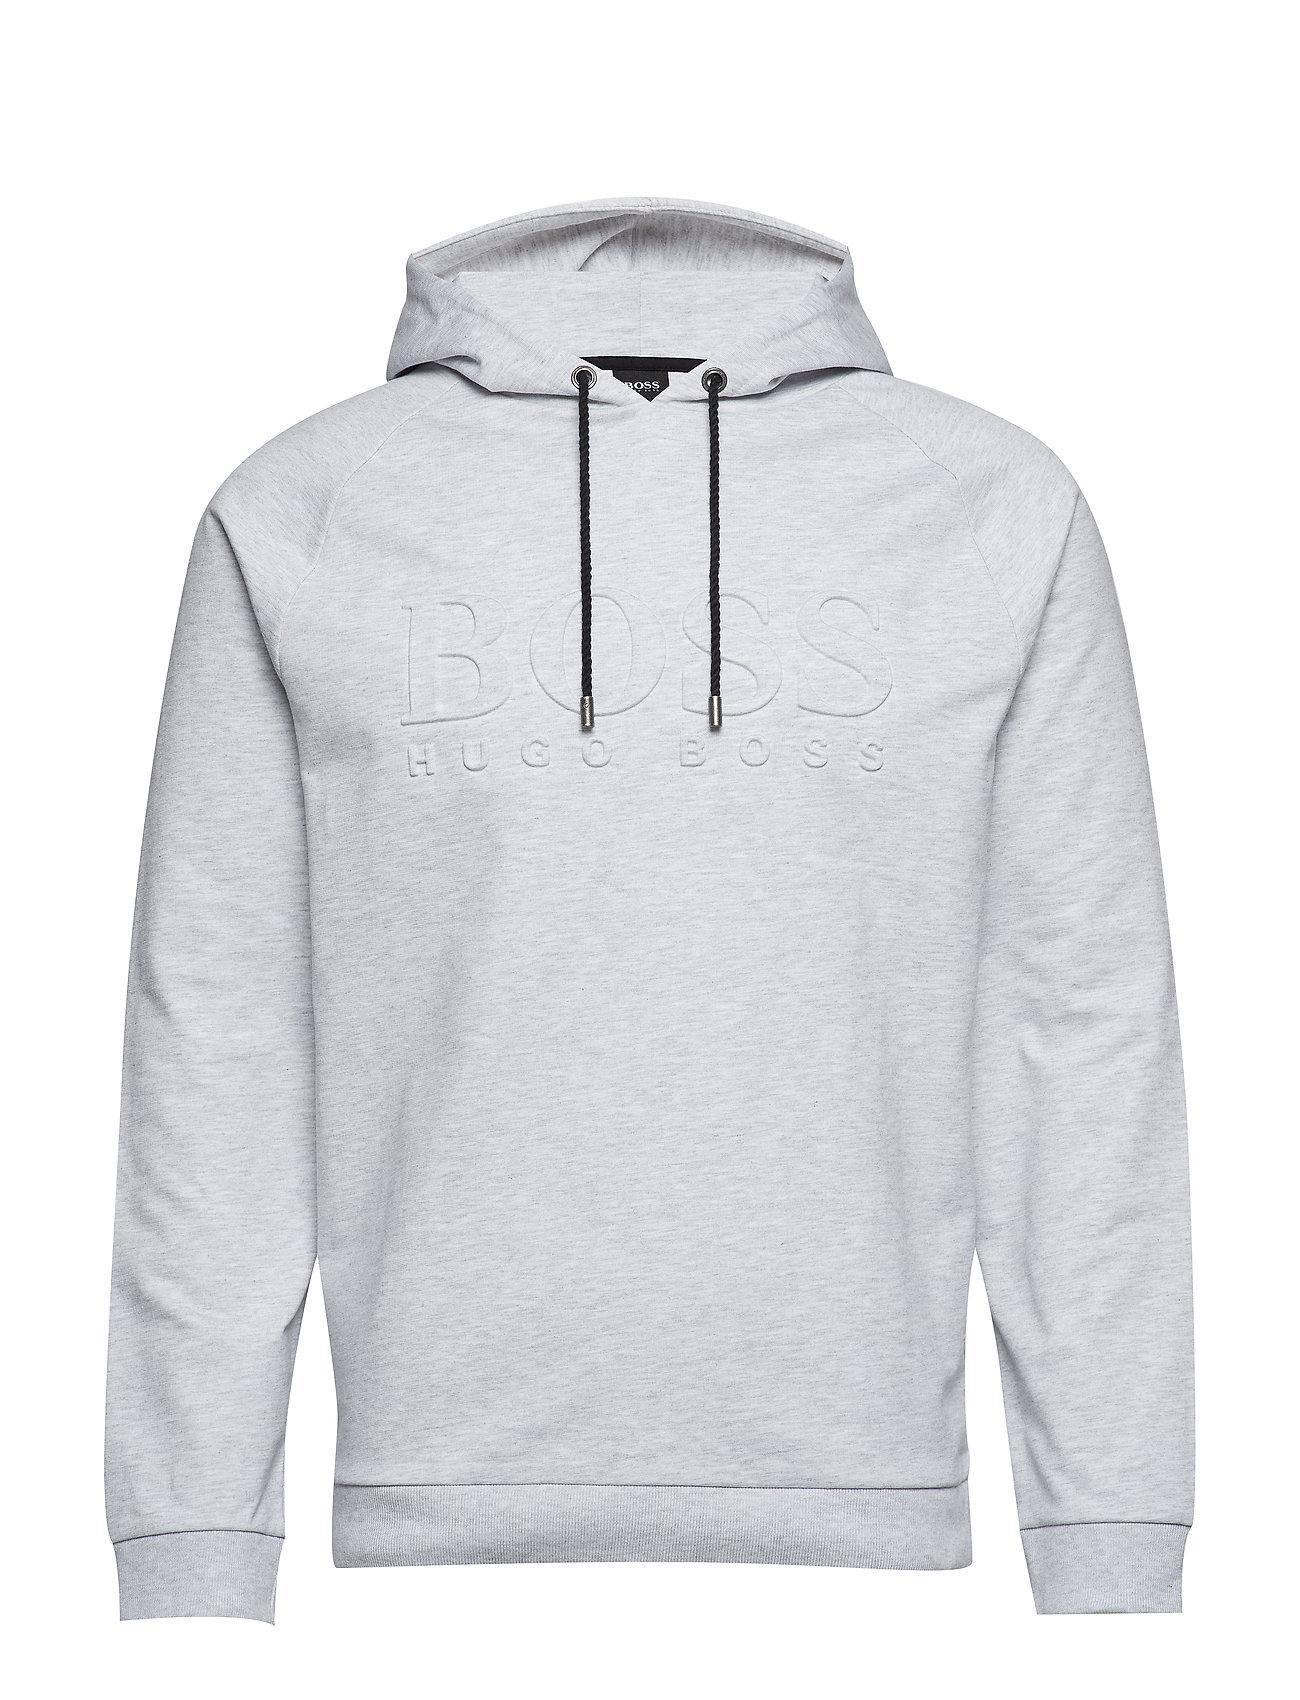 BOSS Business Heritage Sweatshirt - MEDIUM GREY